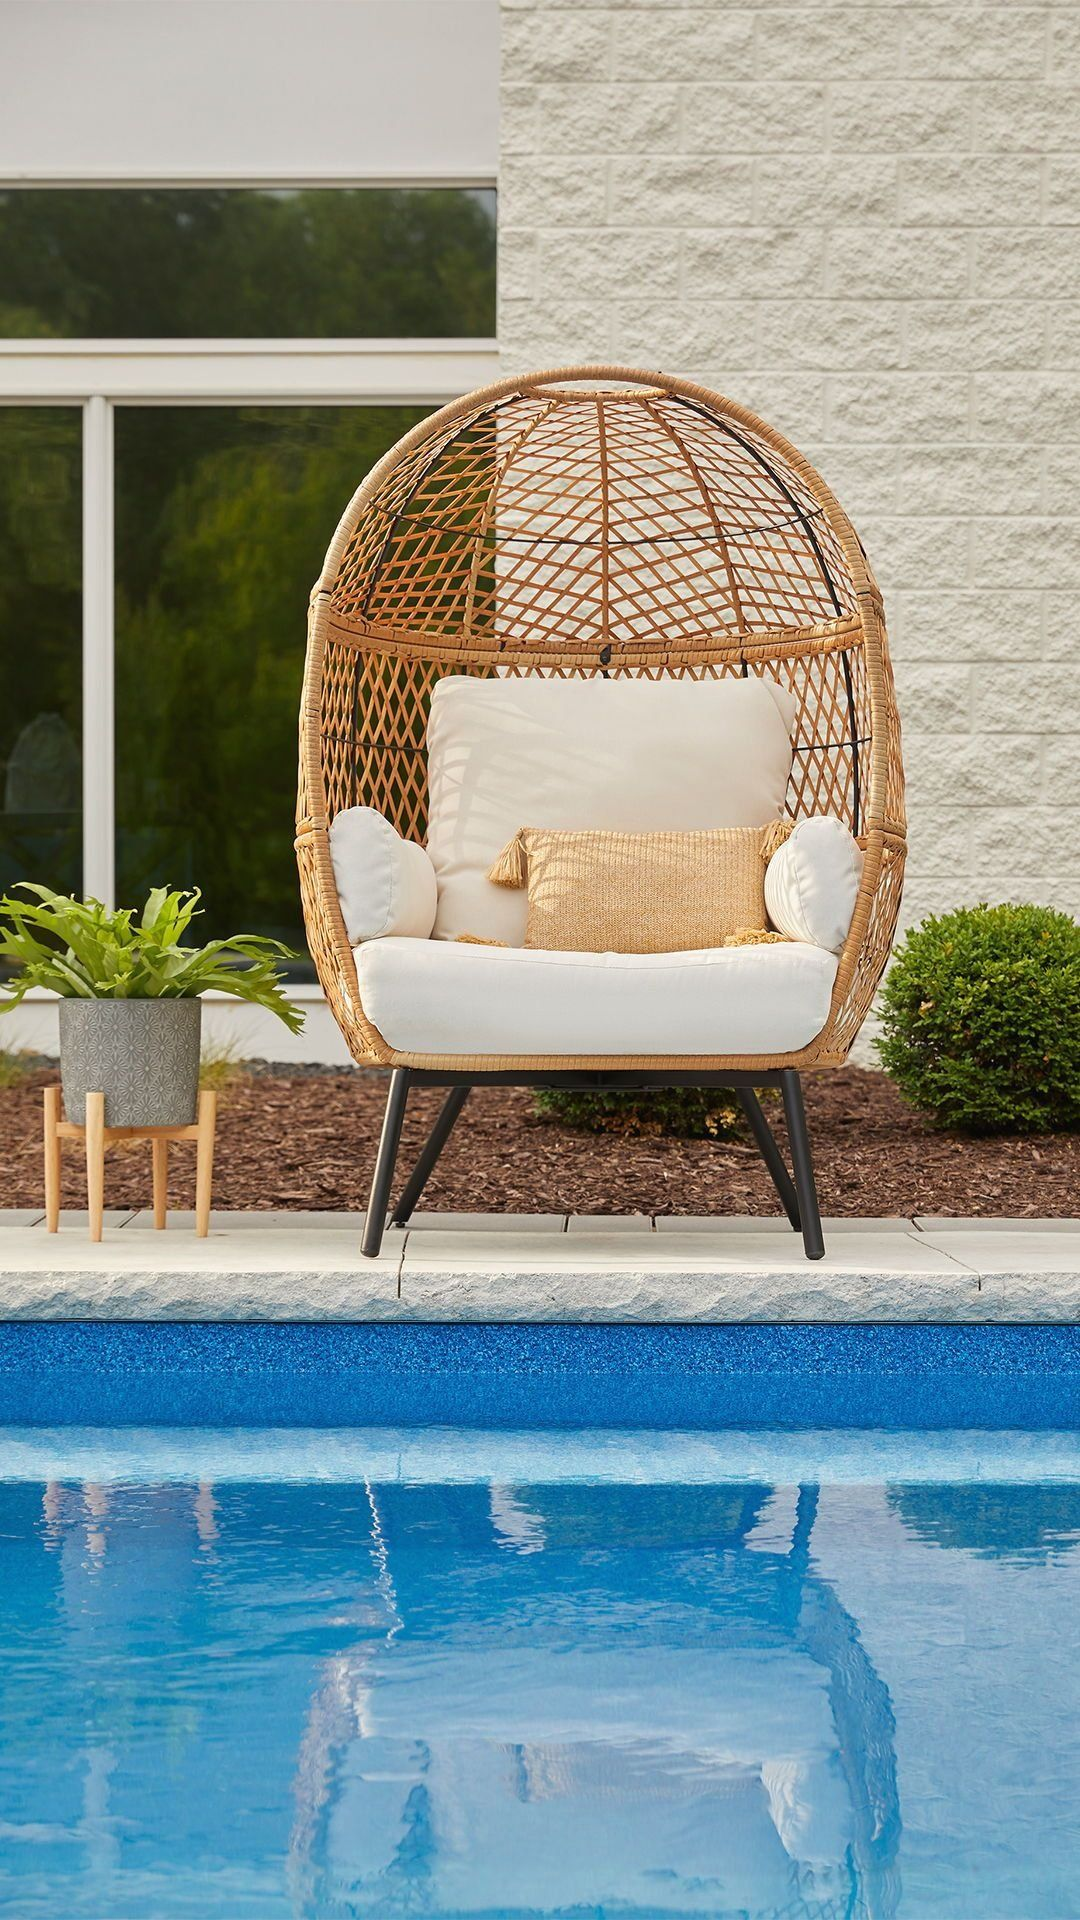 Better homes gardens ventura stationary outdoor egg